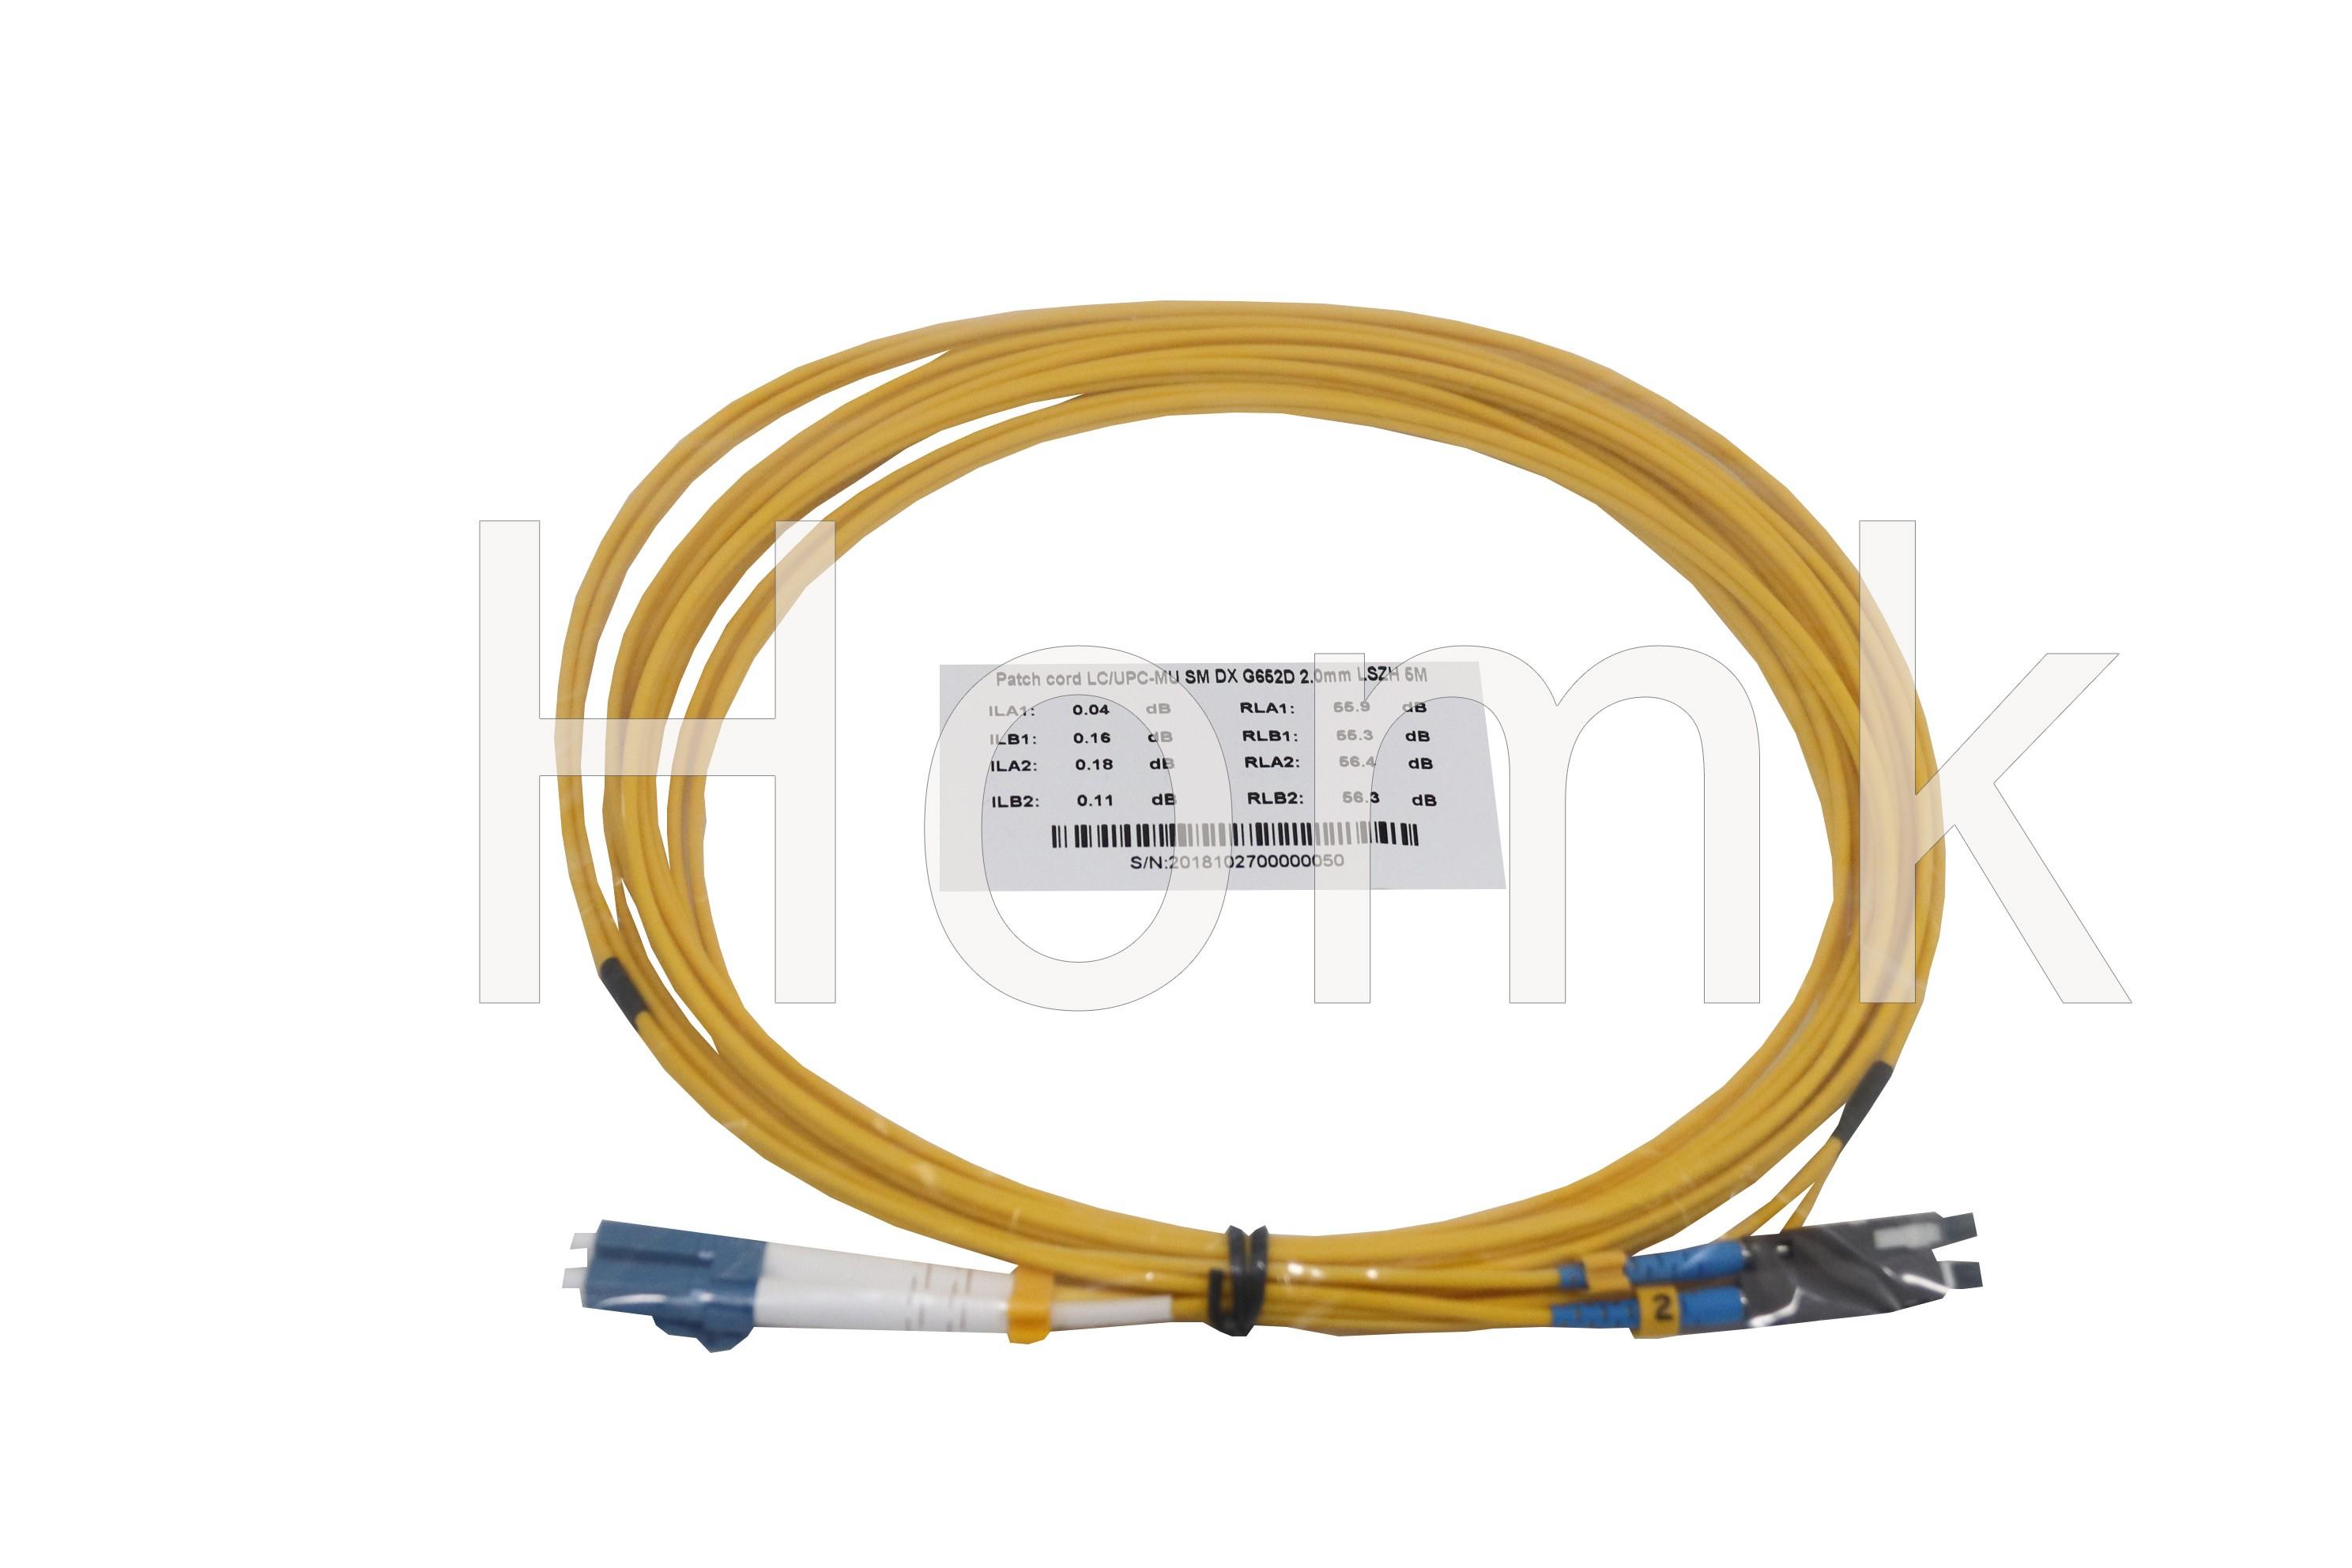 MU-LC SMDX Fiber Patch Cord